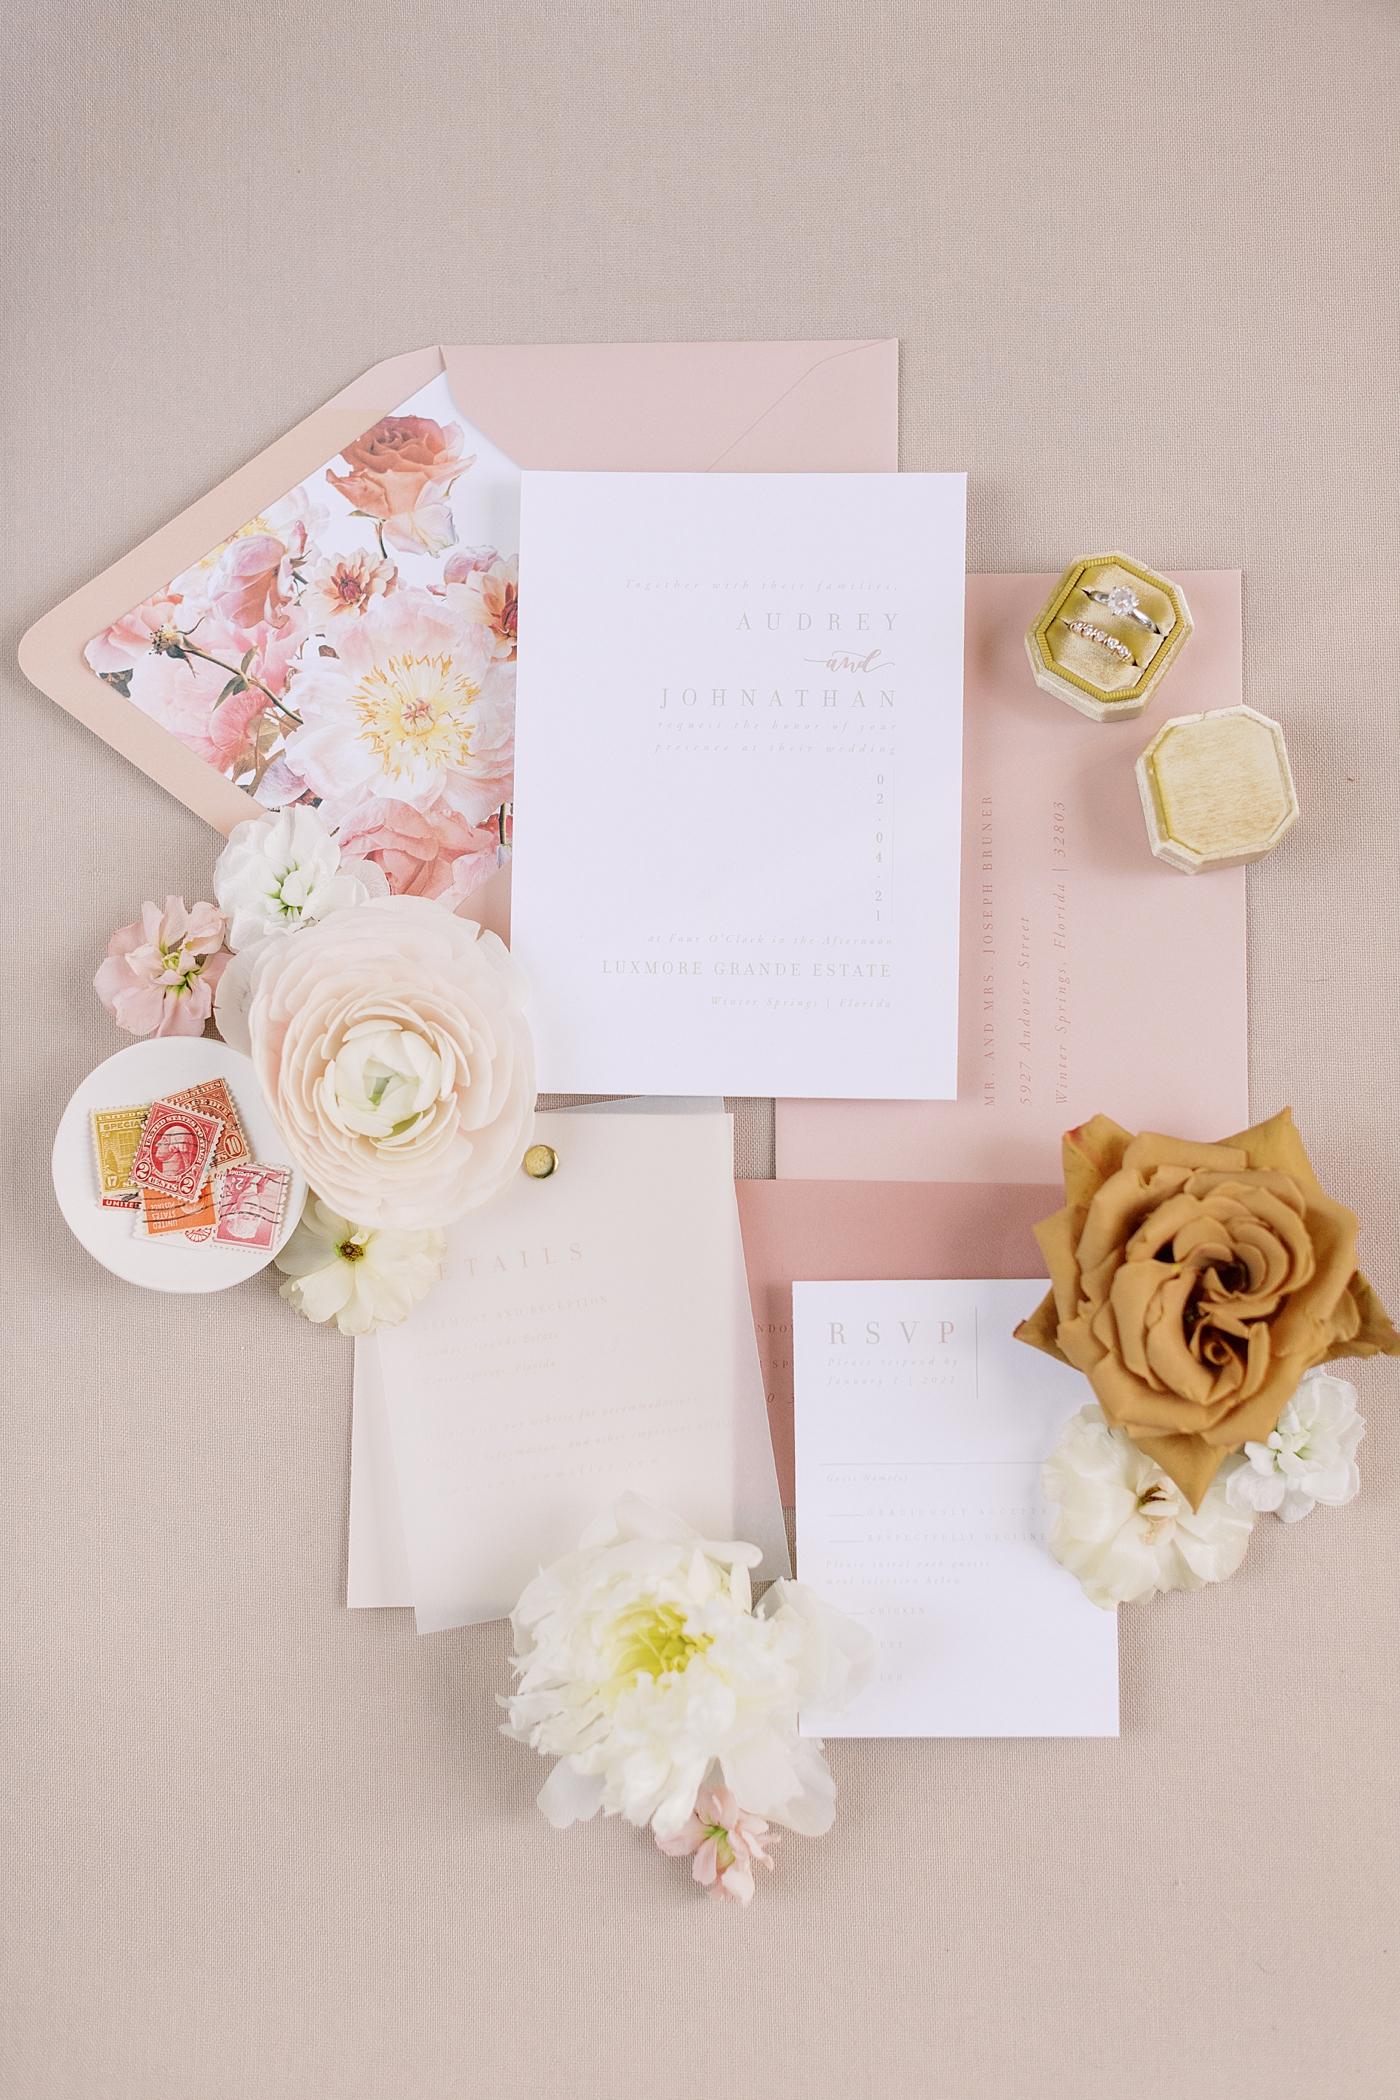 2021 spring wedding inspiration